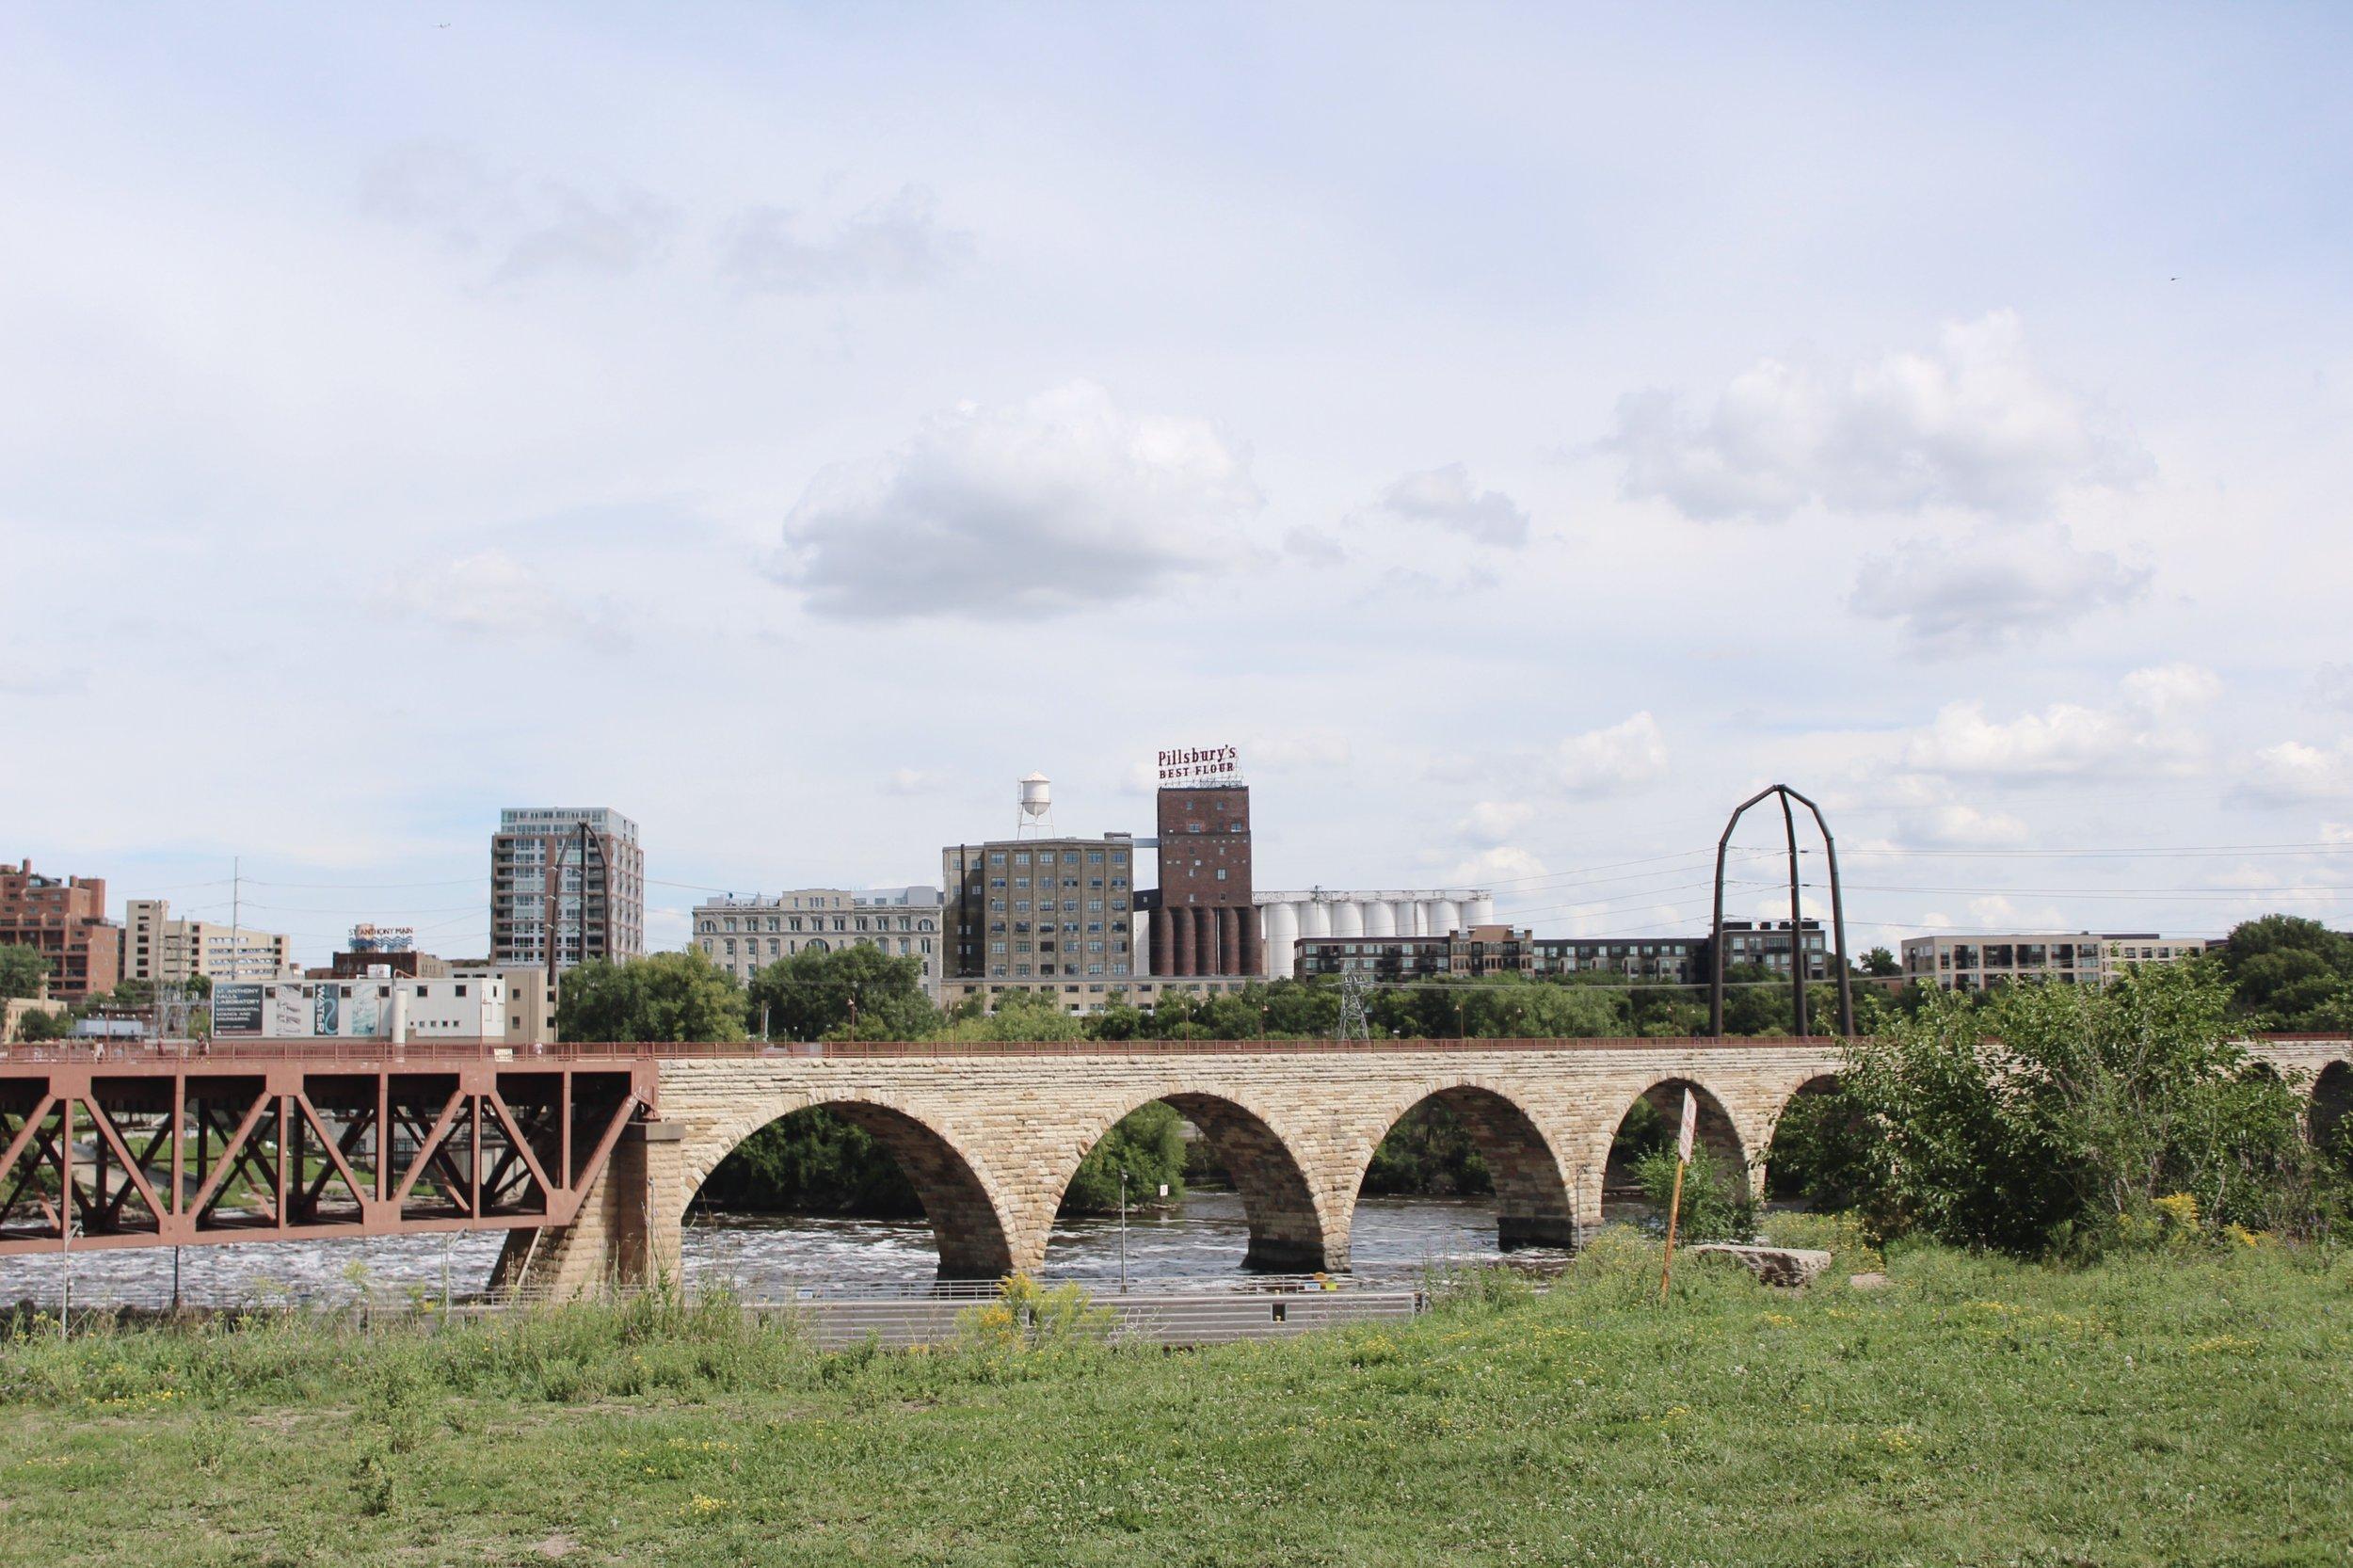 Travel to Minneapolis | www.foundandkept.com